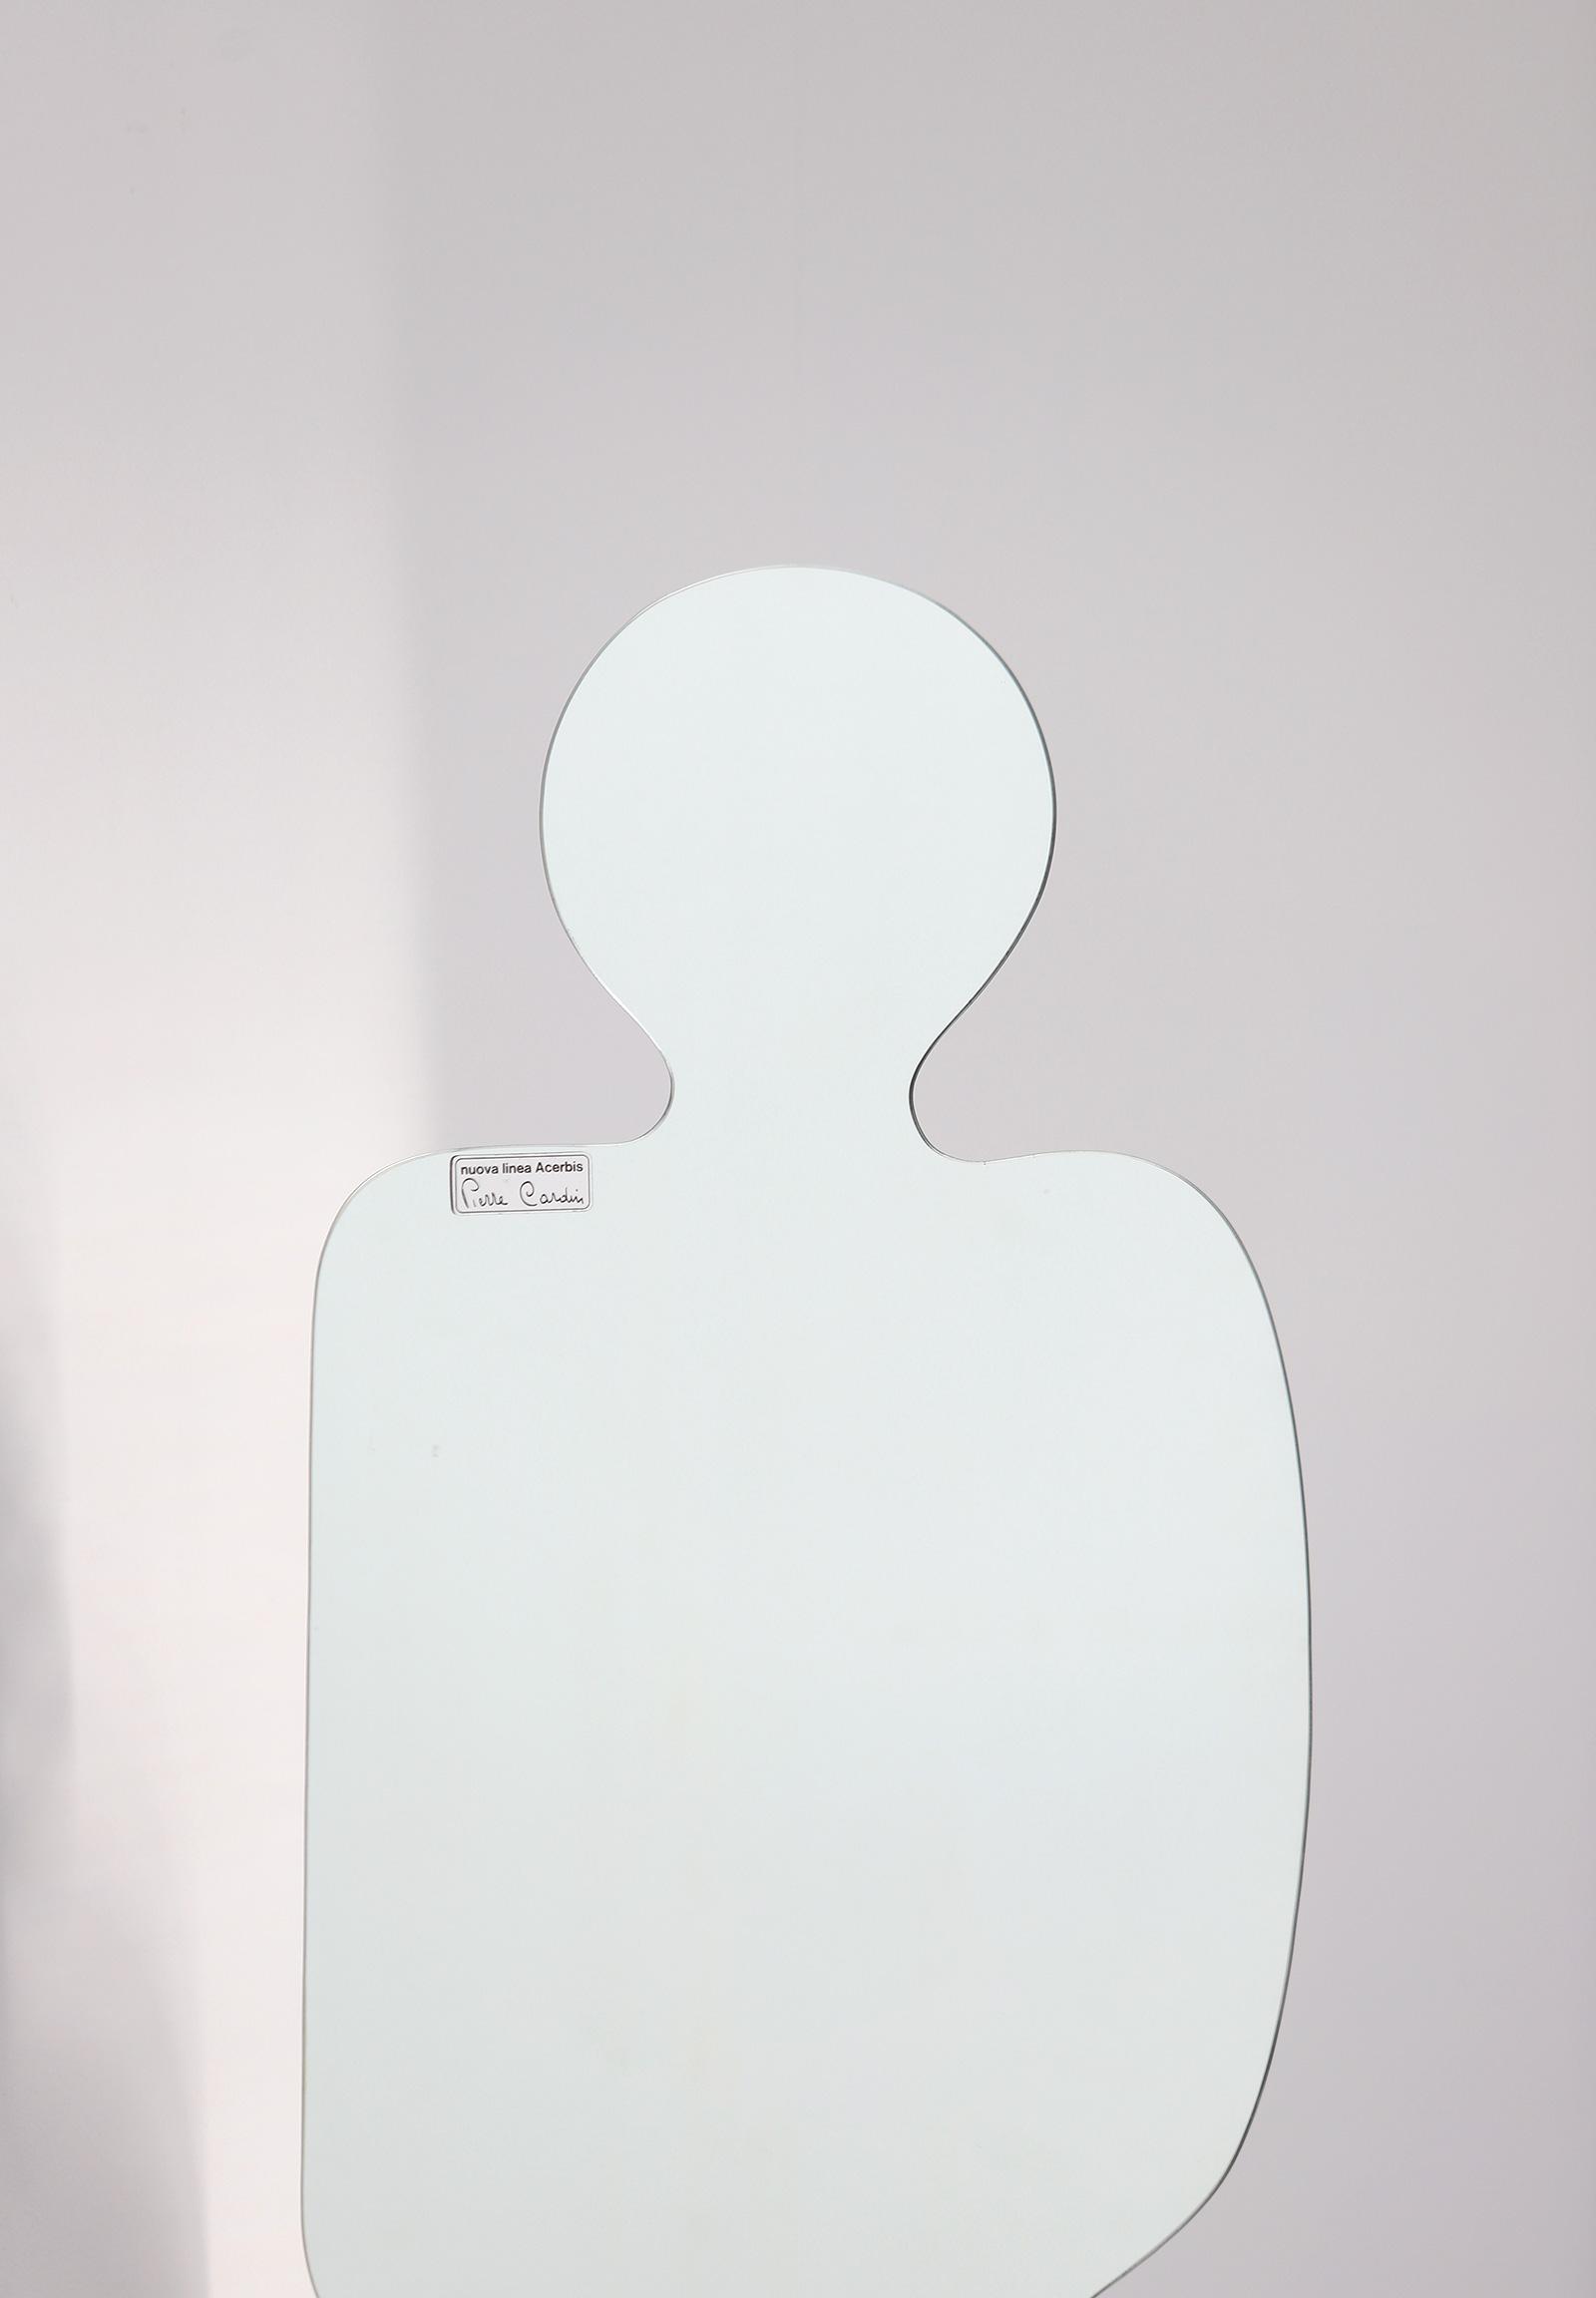 Pierre Cardin Silhouette shaped mirrorimage 7